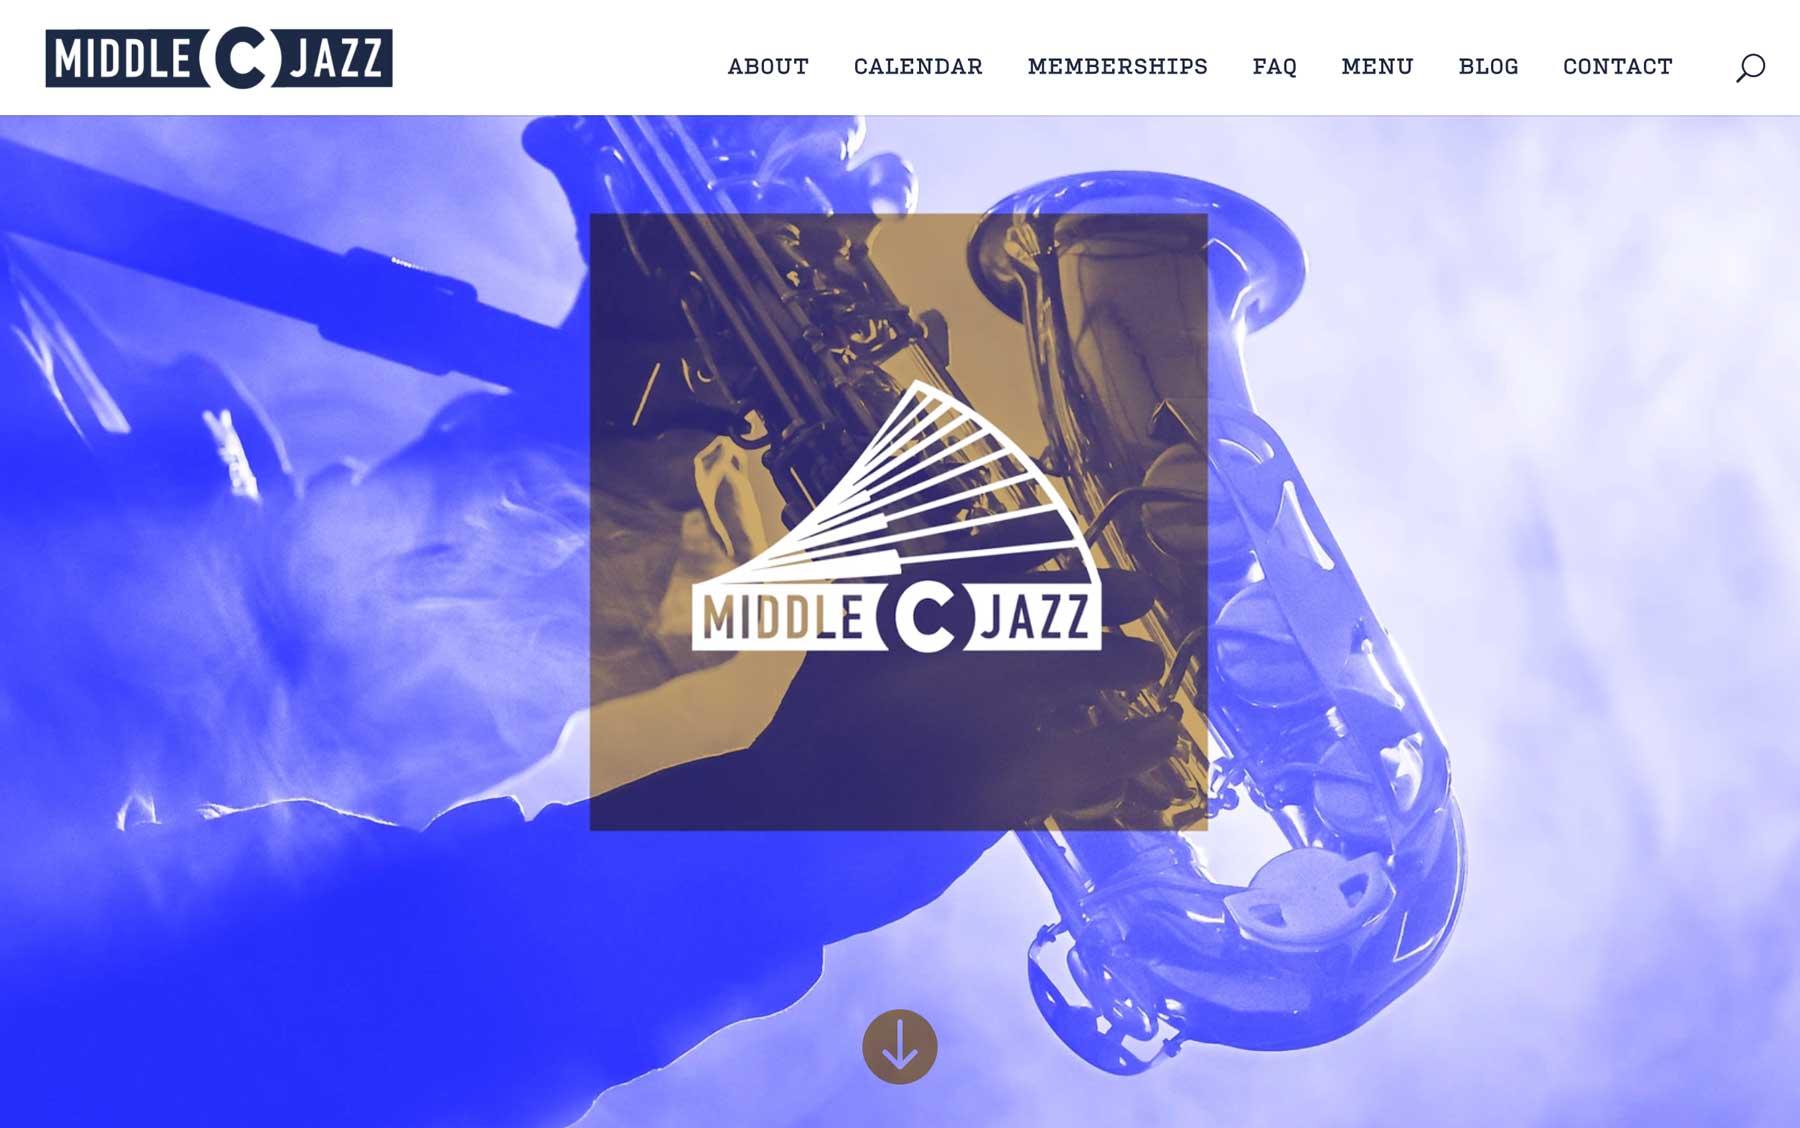 Middle C Jazz